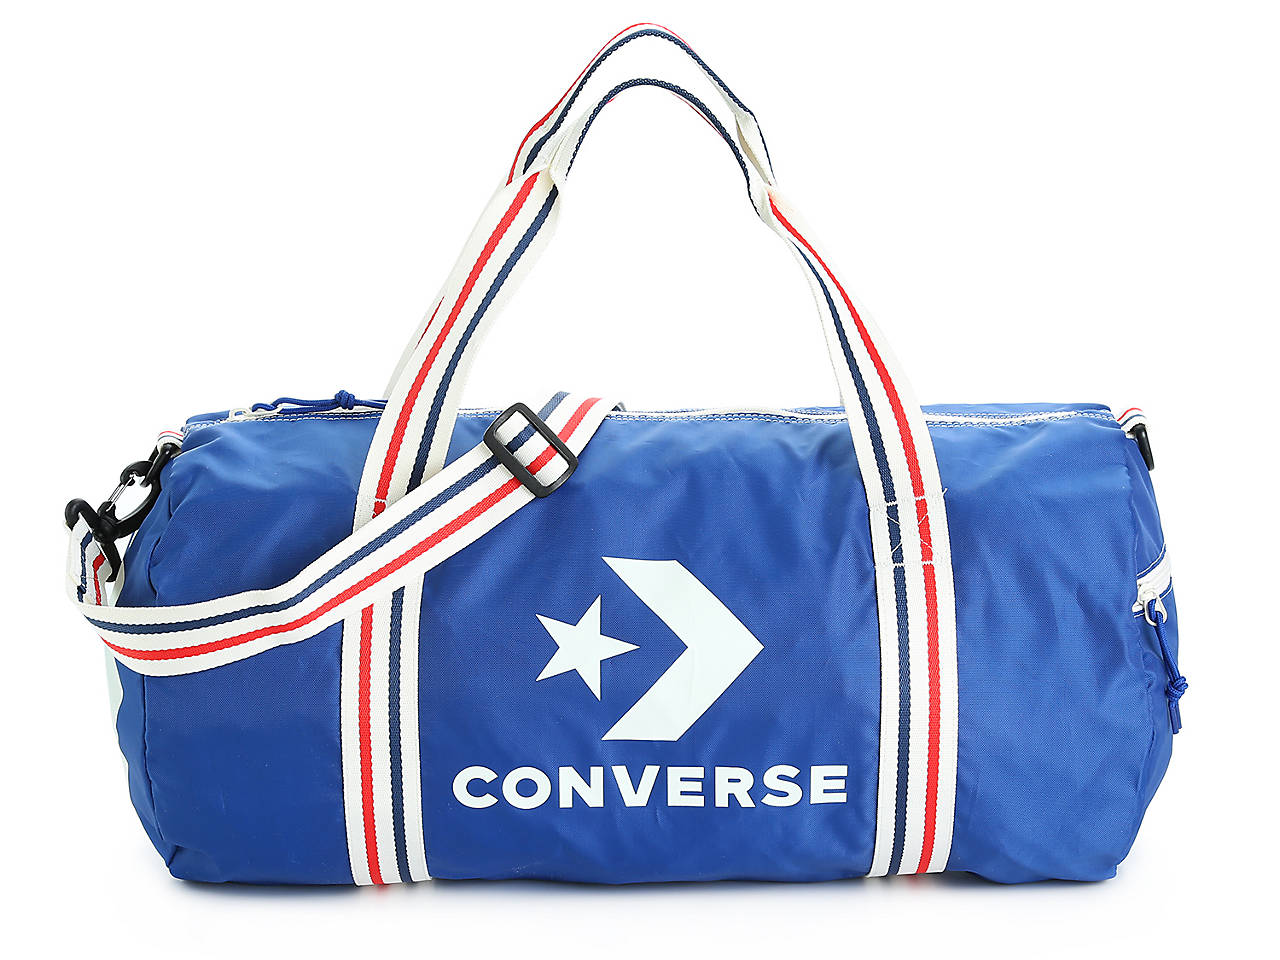 Converse Sport Gym Bag Women s Handbags   Accessories  0a5e86a143d77